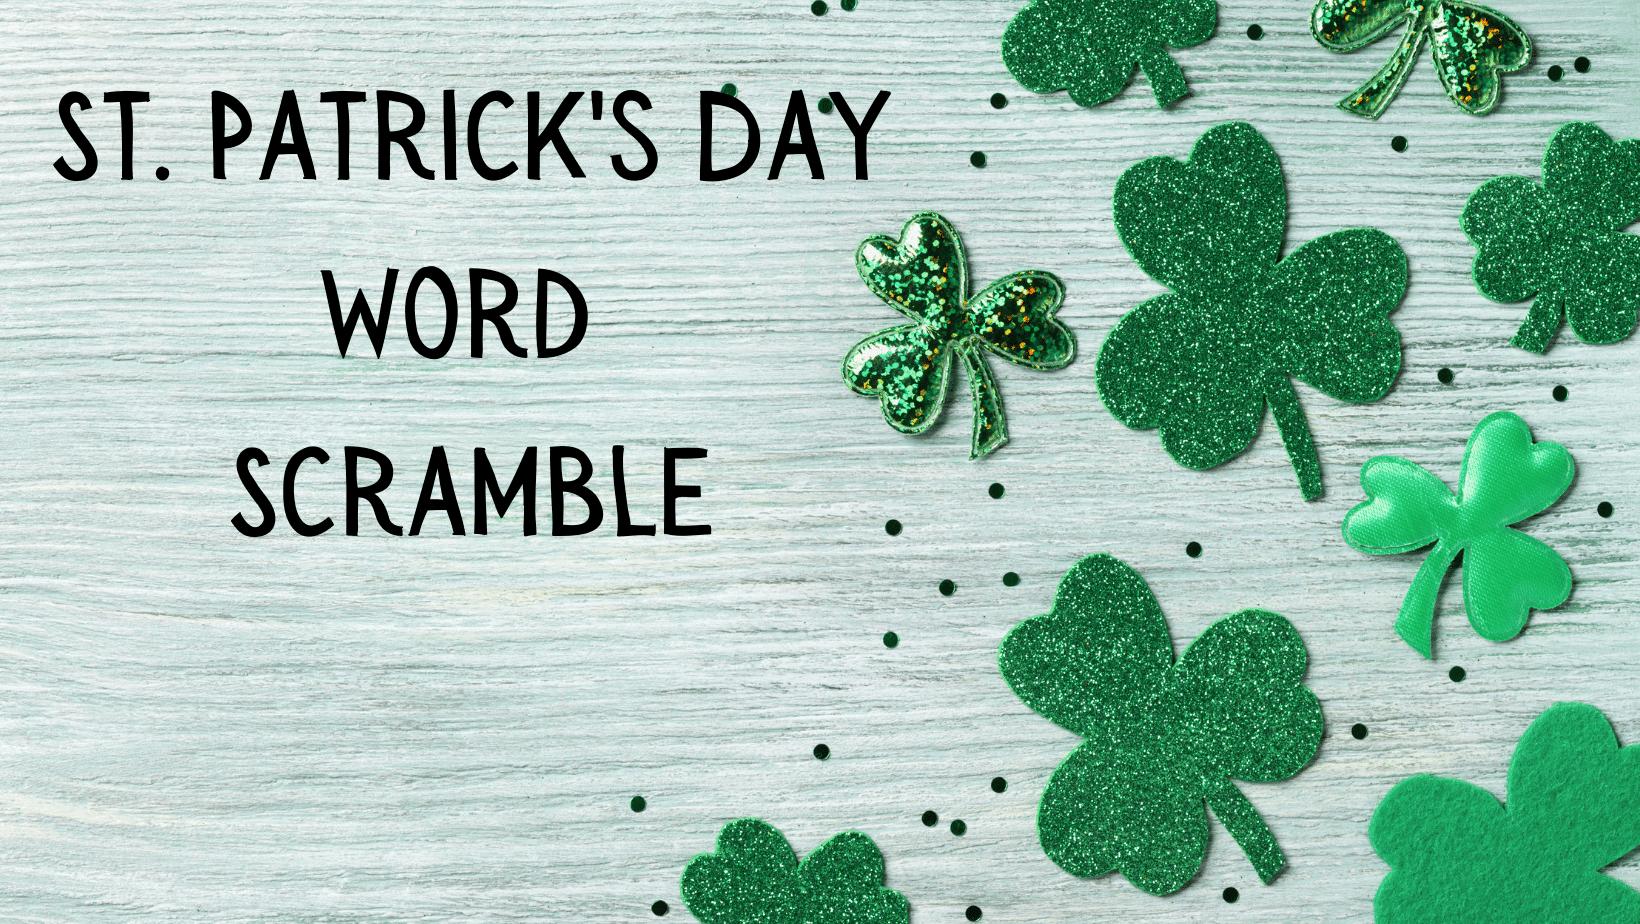 St Patrick's Day Word Scramble-Free Printable